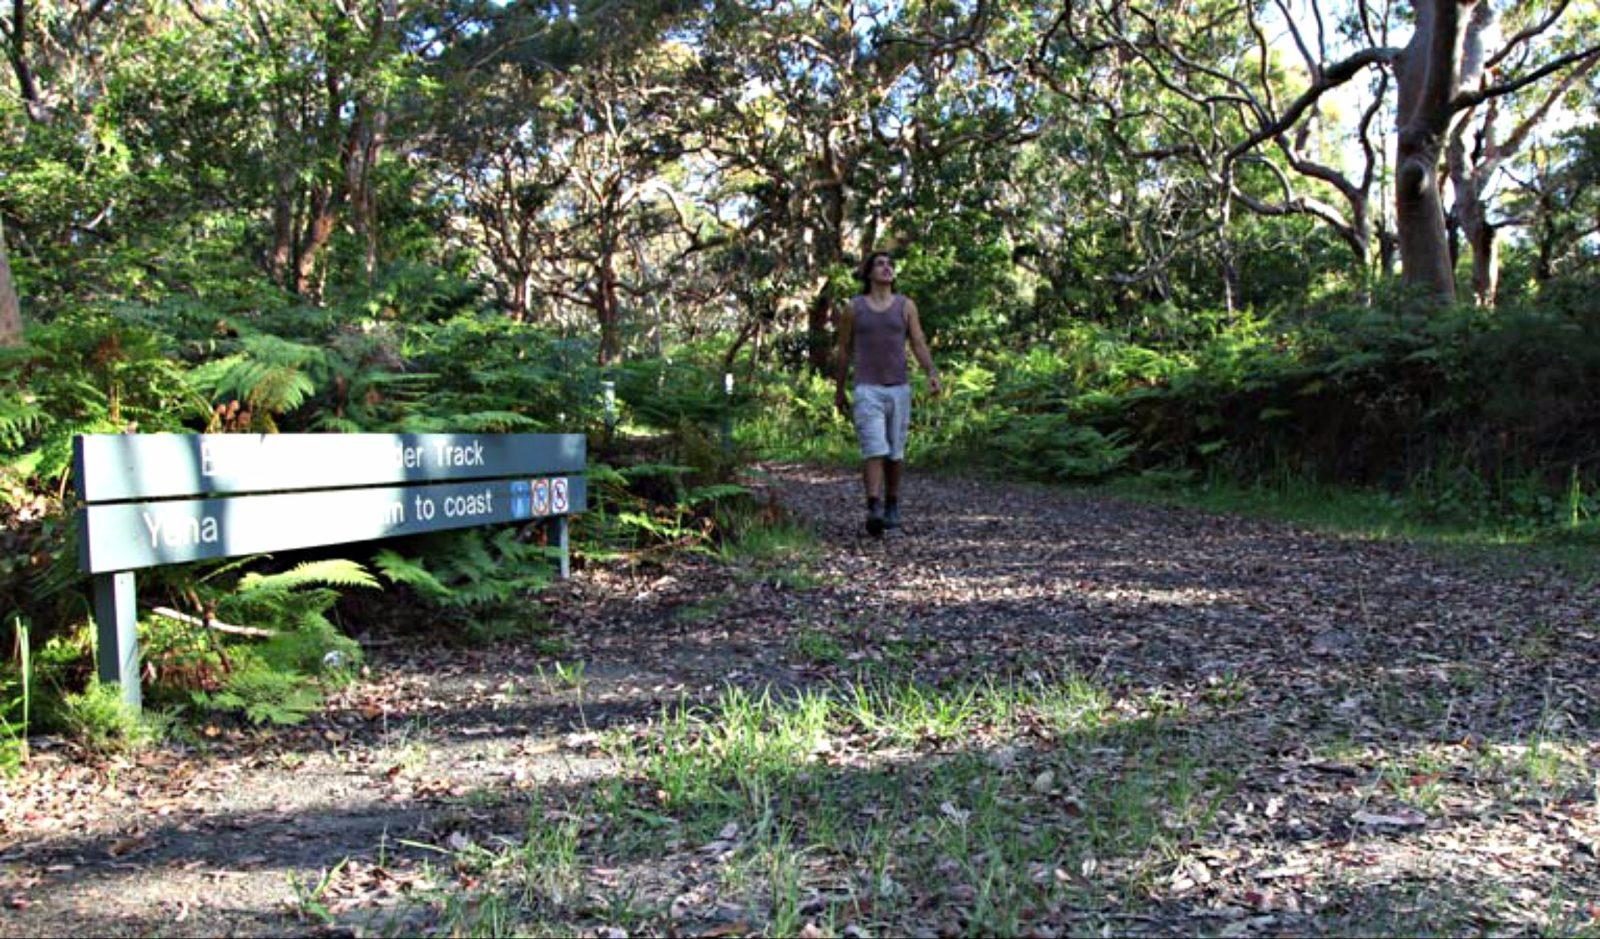 Banks-Solander track, Kamay Botany Bay National Park. Photo: Andy Richards